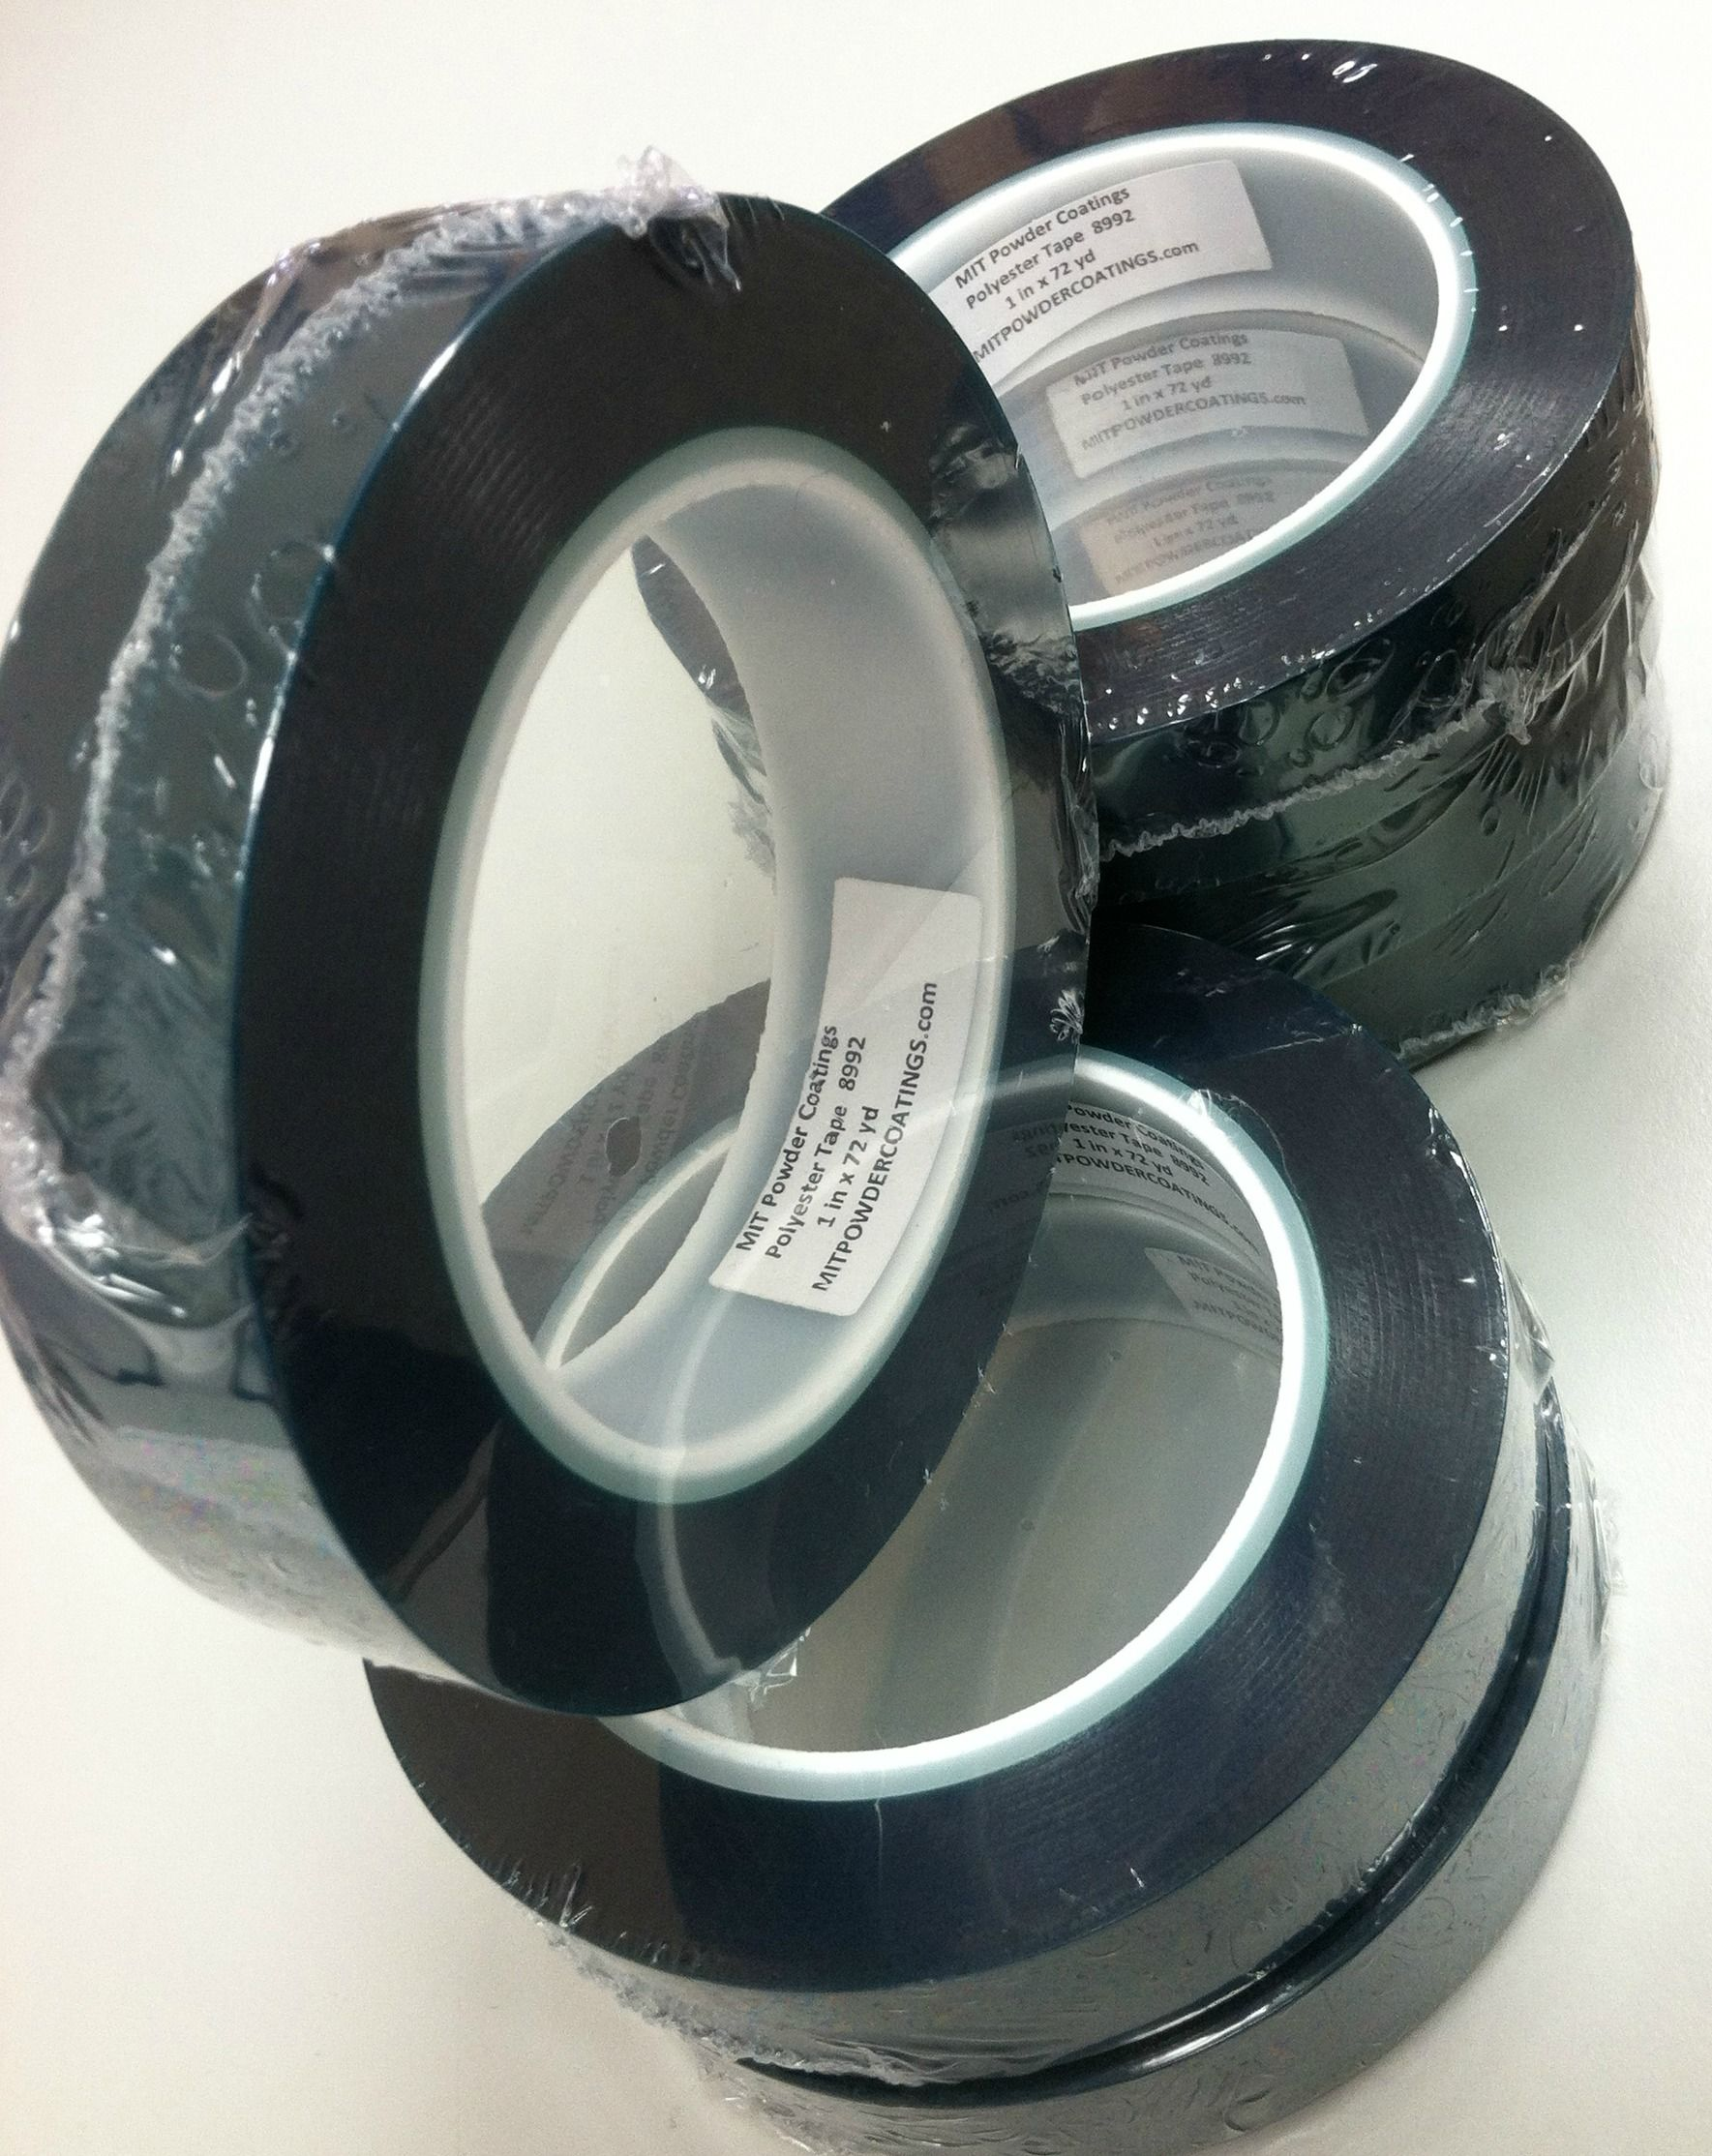 1inch X 72 Yard 3m Polyester Heat Tape 8992 Green Http Www Mitpowdercoatings Com 3m Polyester Tape 8992 Green 1 In X 72 Yd Heat Tape Tape Masking Tape